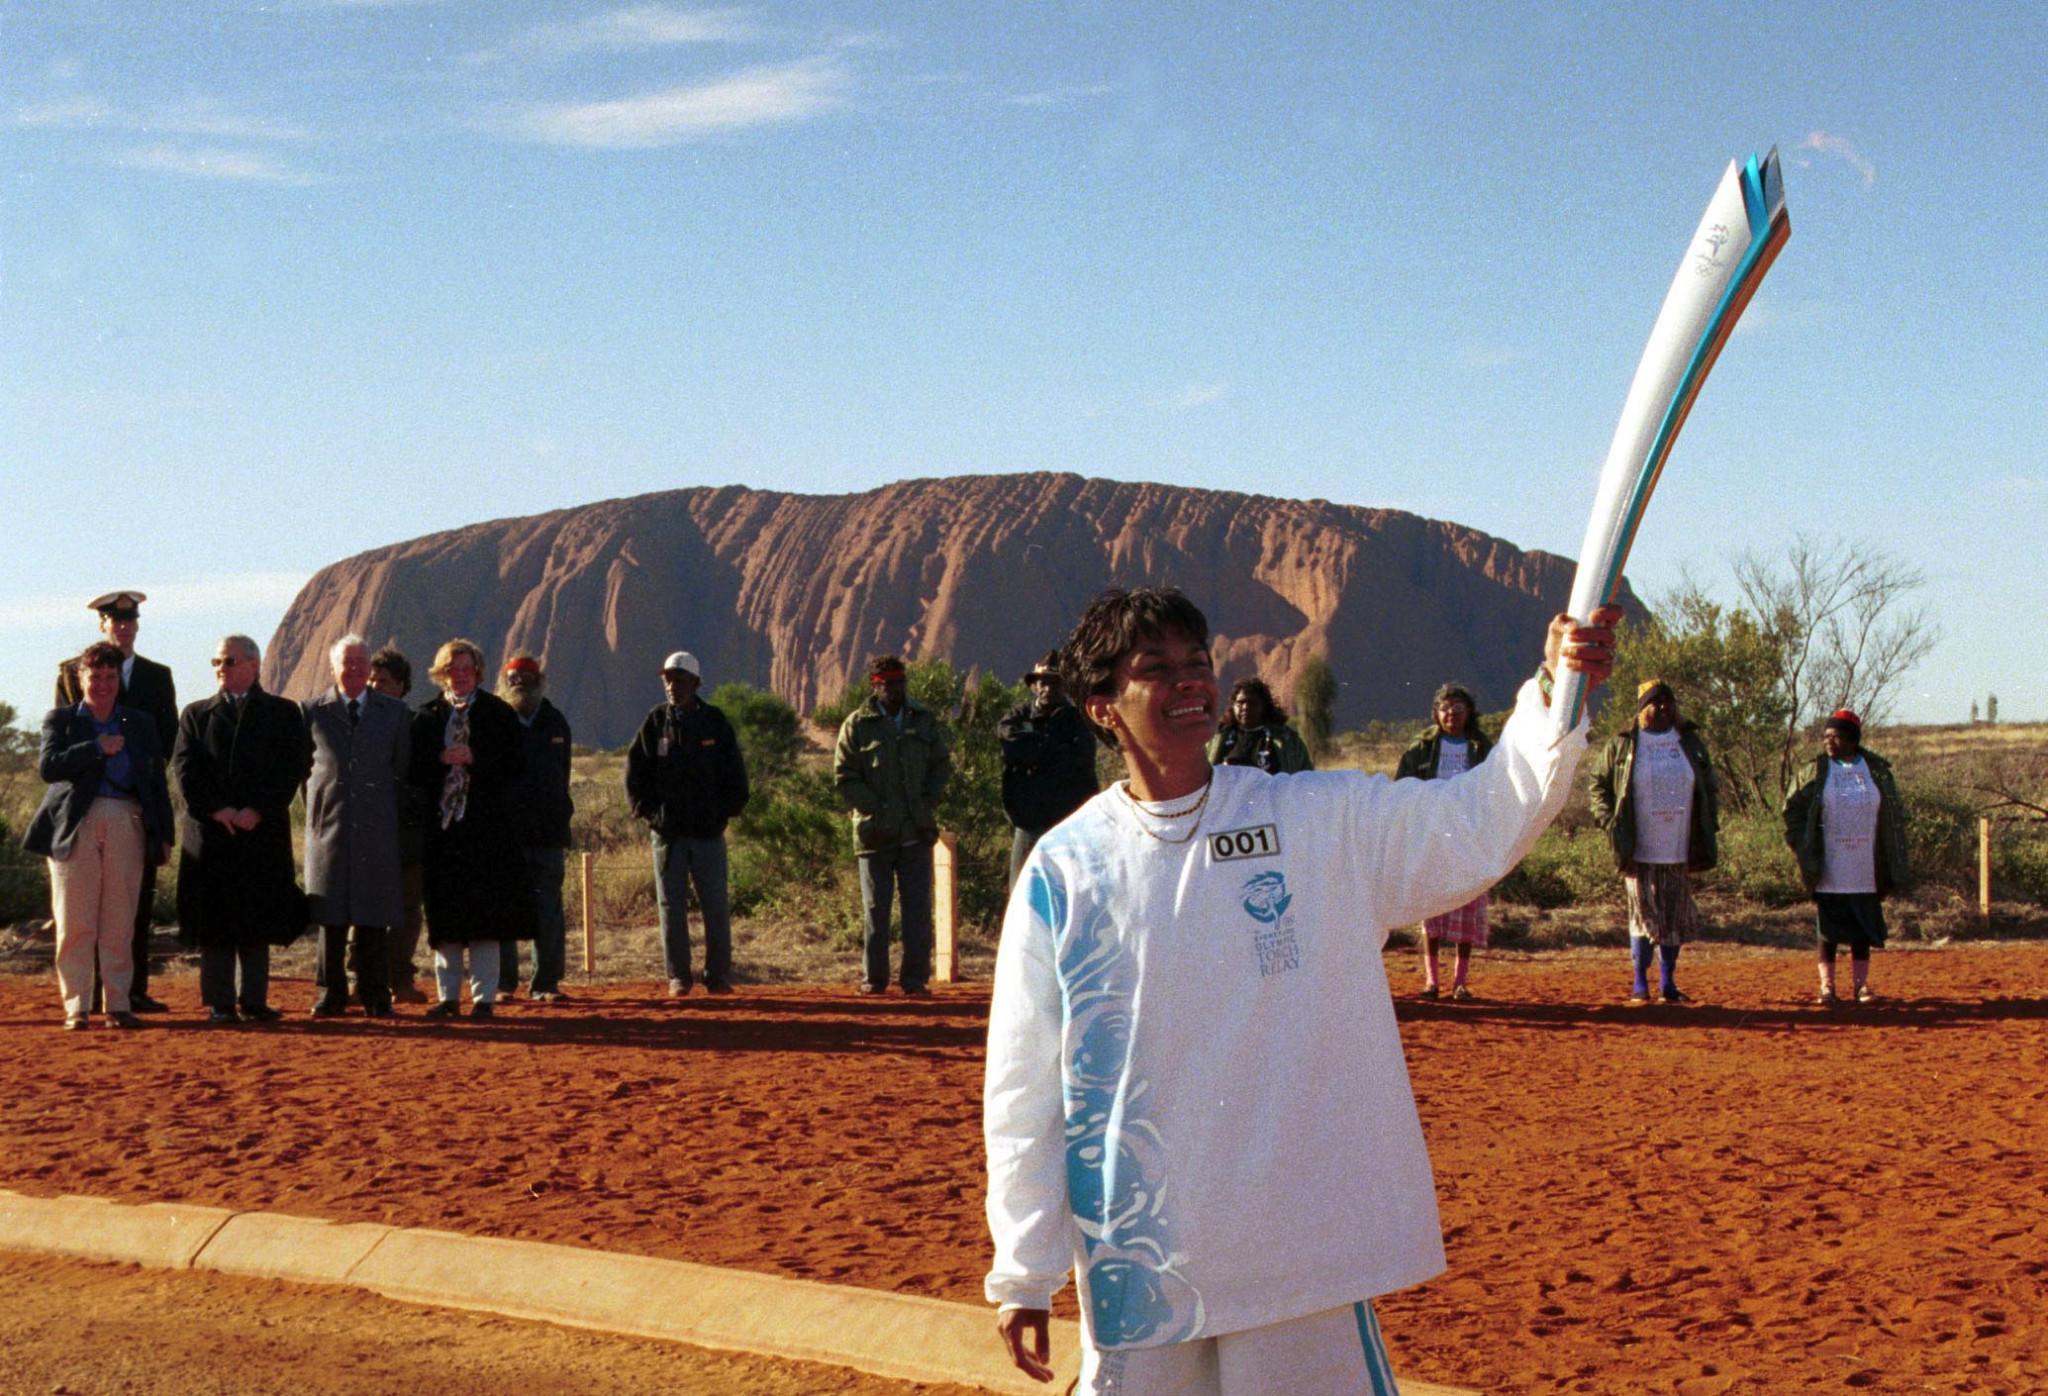 Australian Olympian Nova Peris with the Sydney 2000 Torch at Uluru ©Getty Images